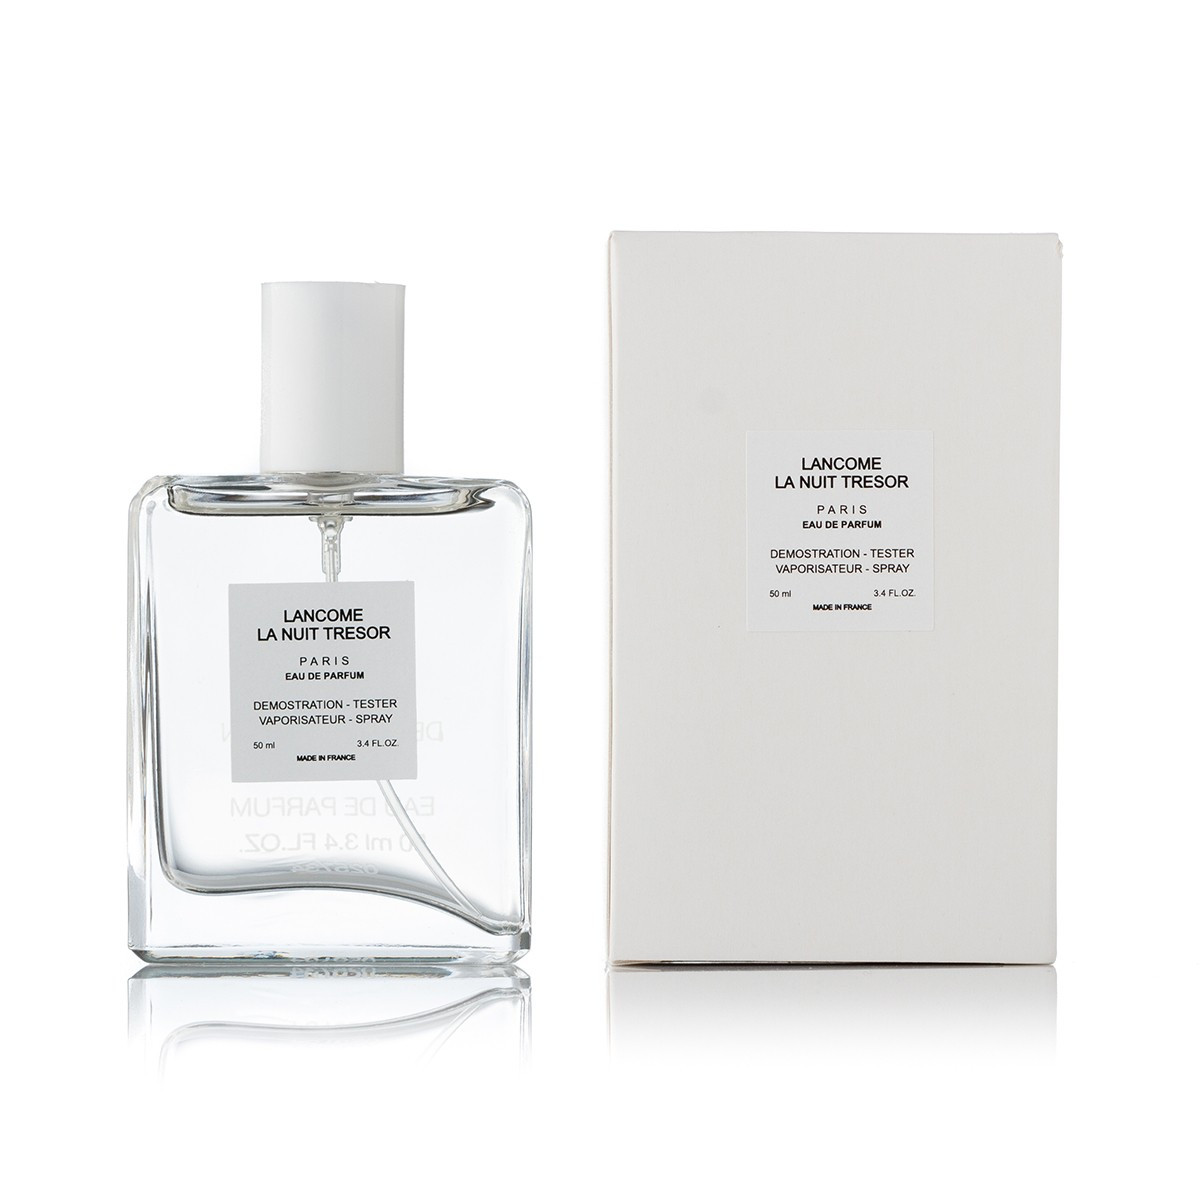 Lancome La Nuit Tresor - White Tester 50ml